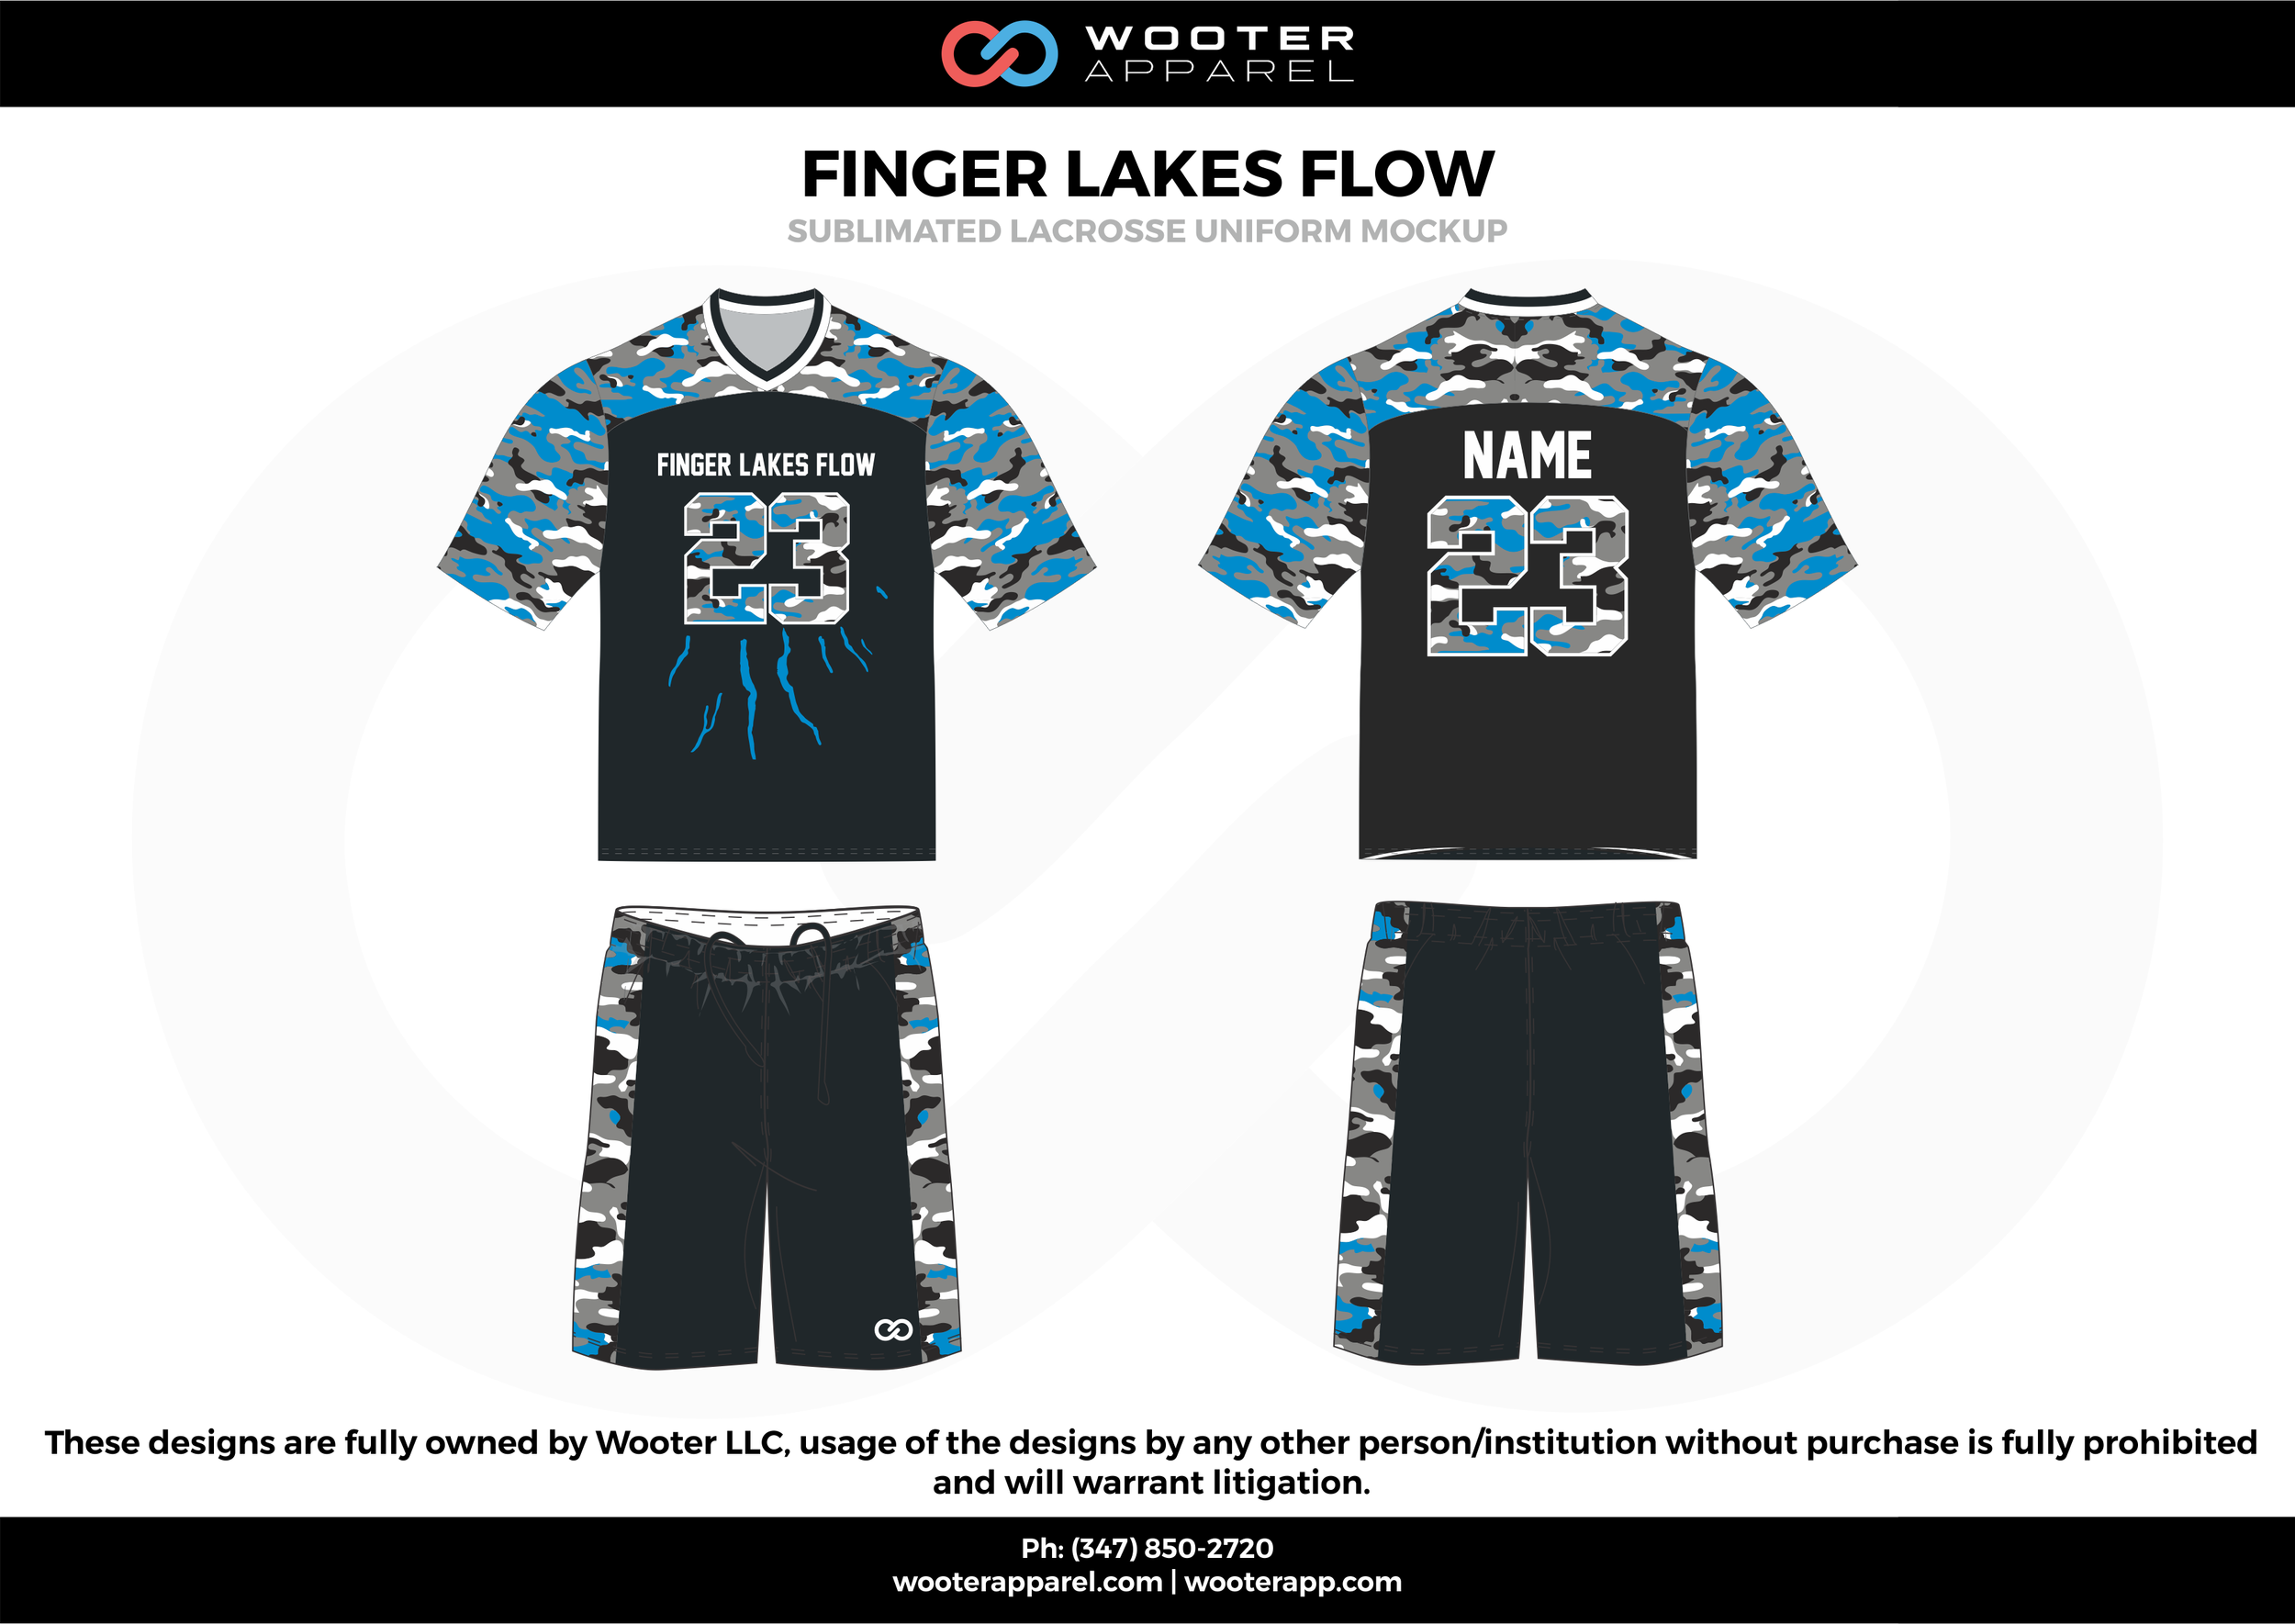 FINGER LAKES FLOW black blue white Lacrosse uniforms jerseys shirts shorts